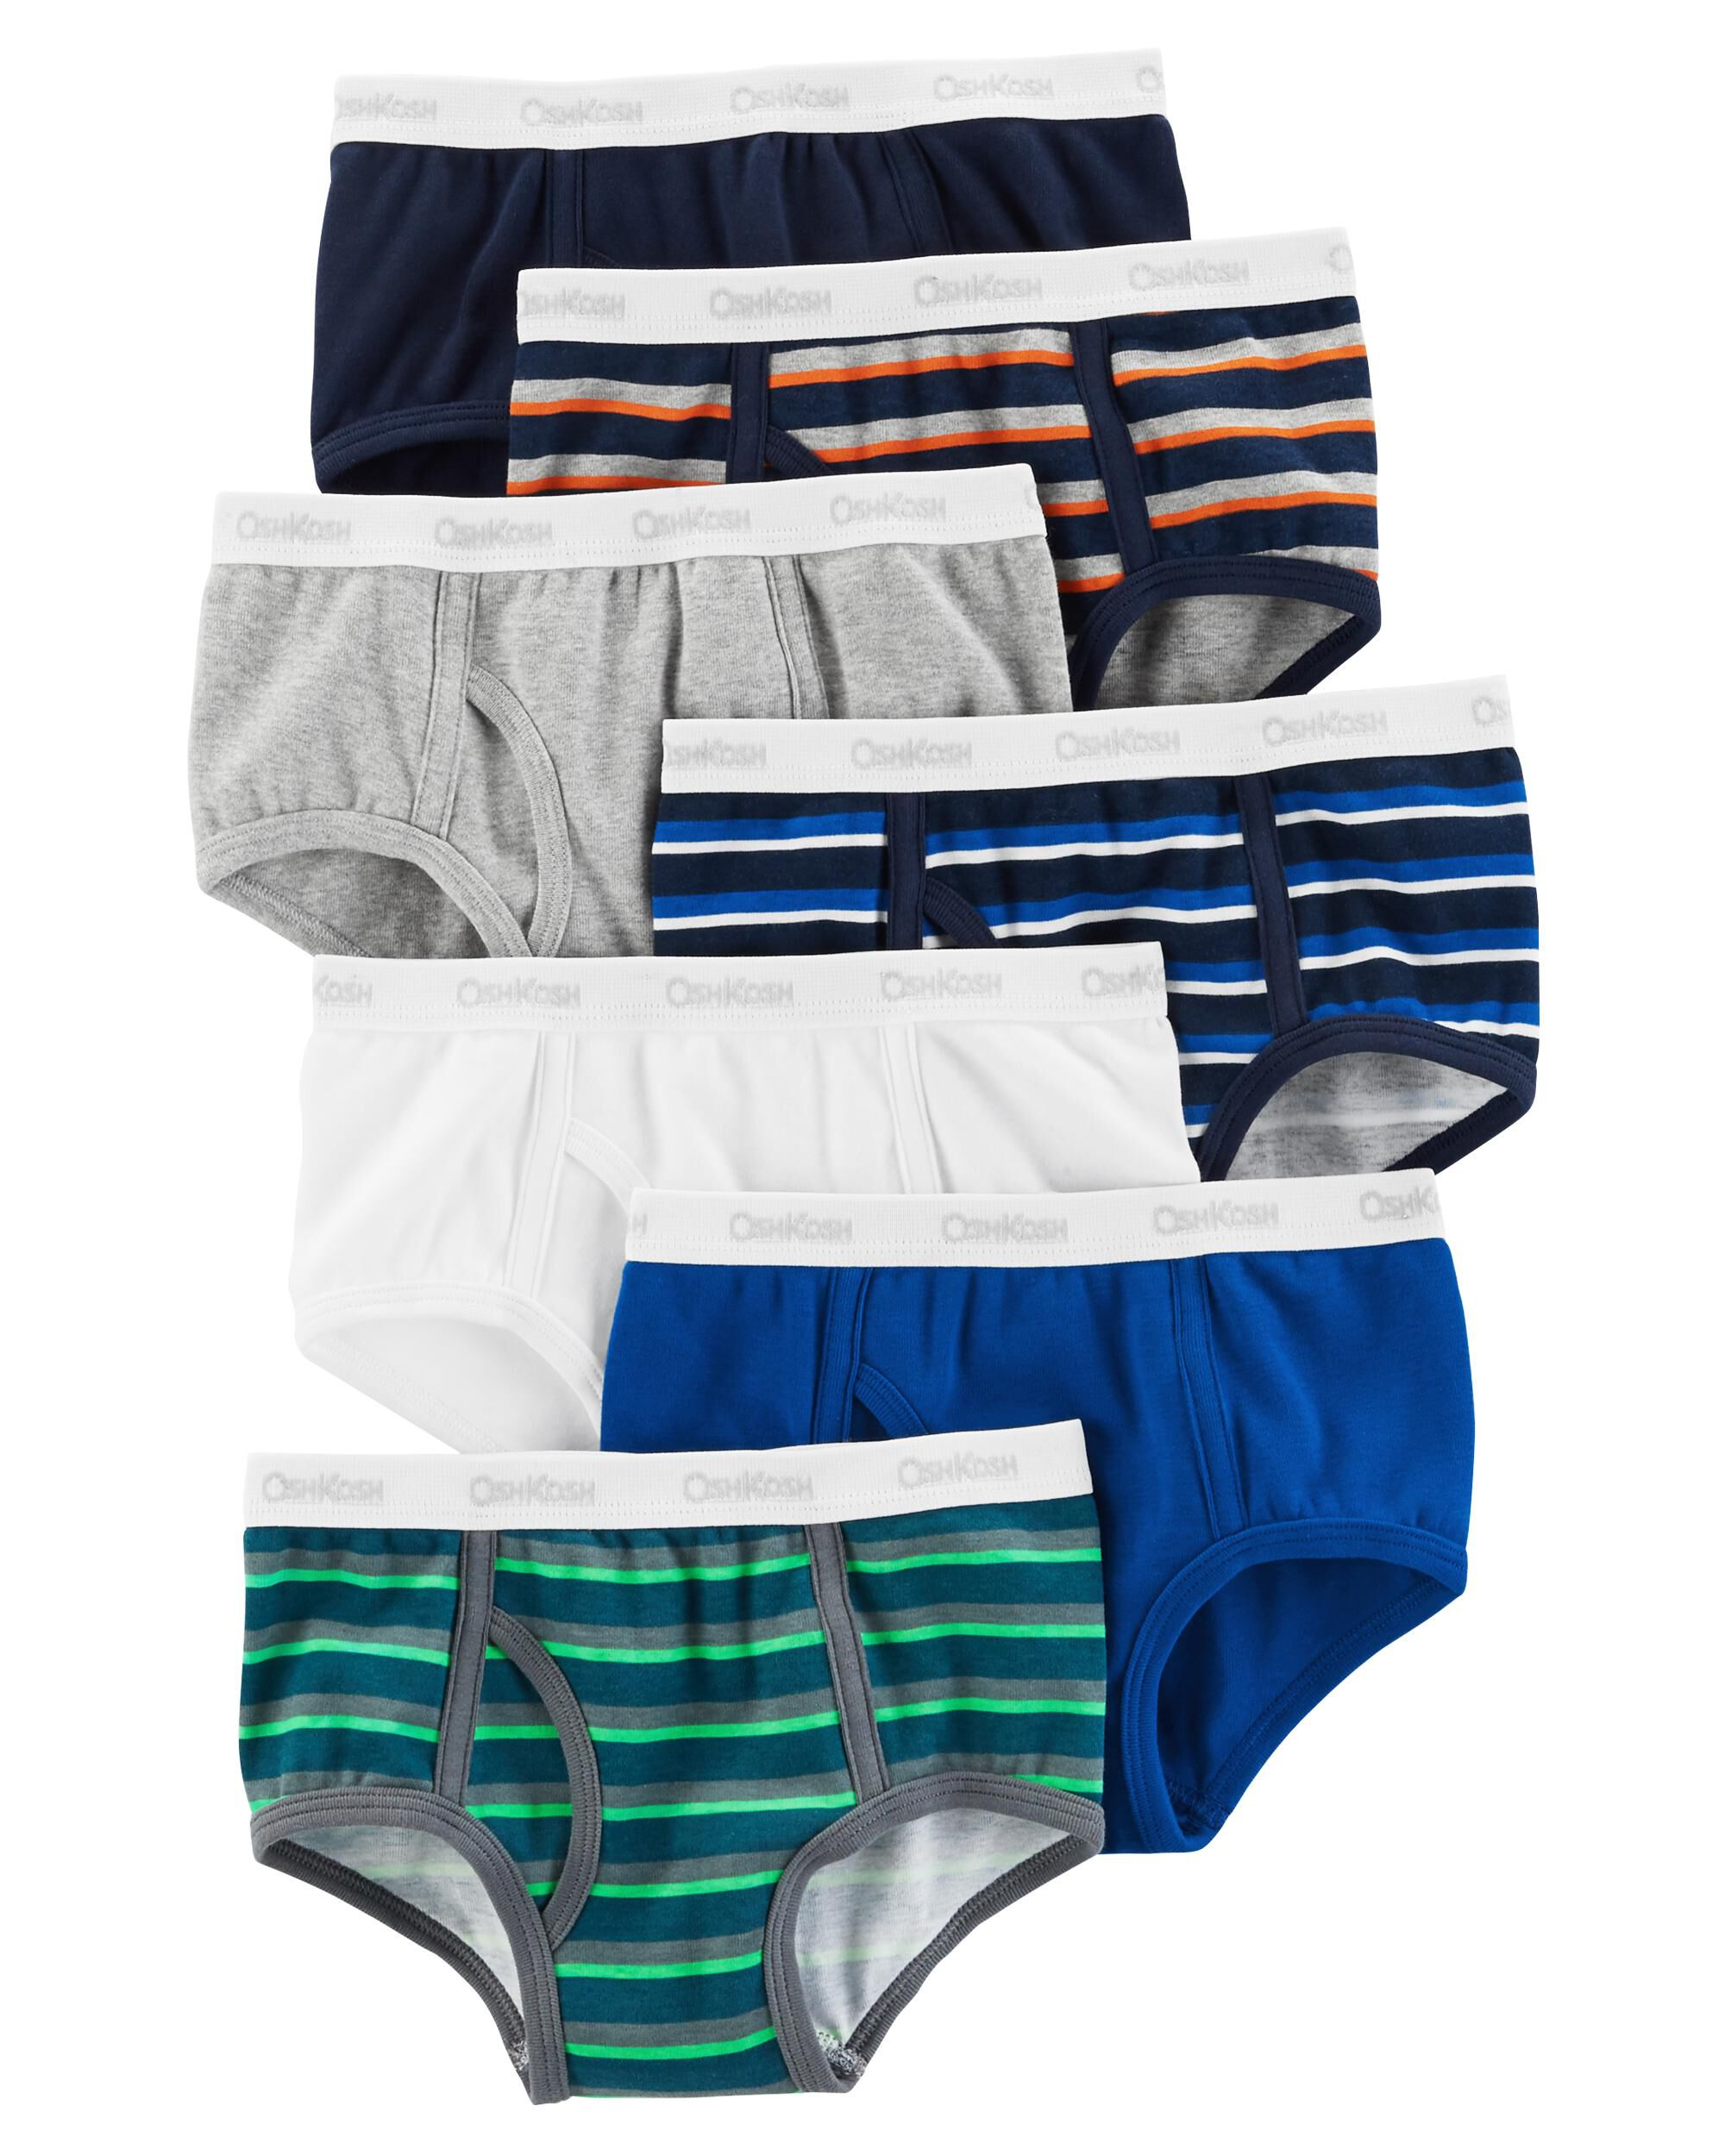 New OshKosh Boy 7 Pack Underwear Boys Briefs NWT 4 8 14 Year Solid White Red